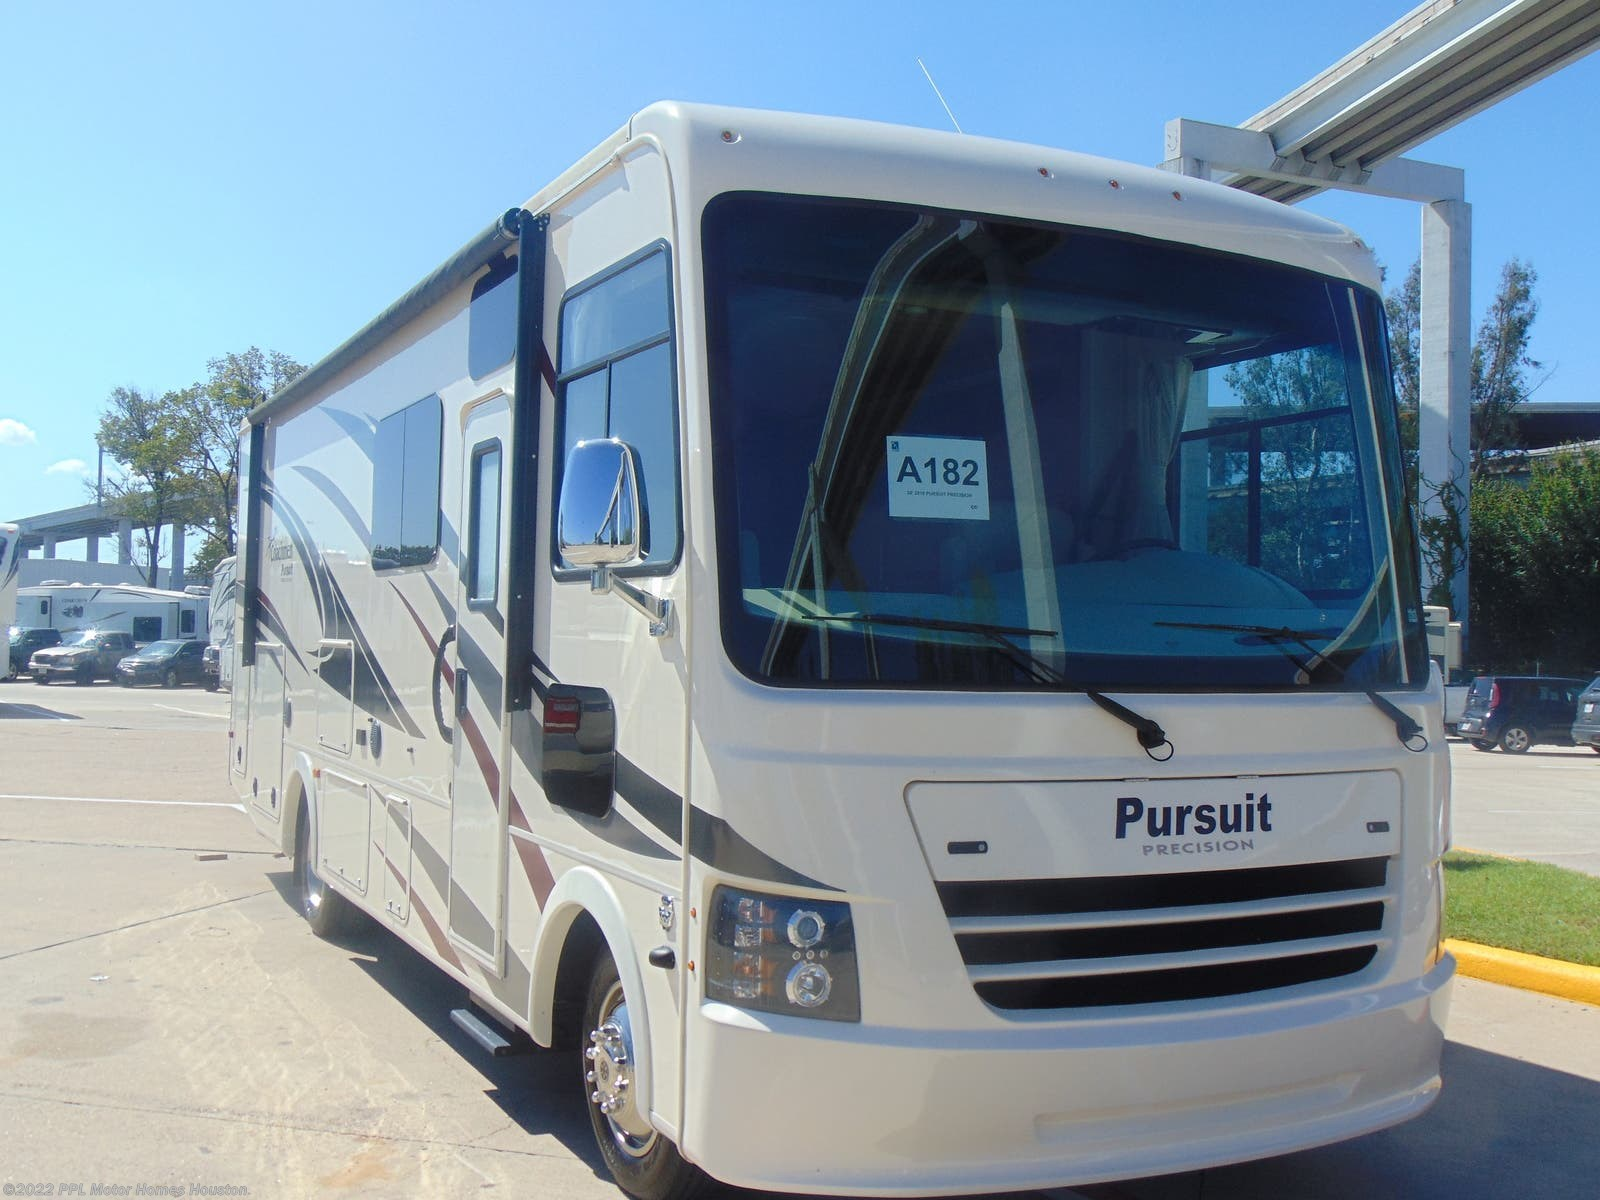 Used Rv Houston >> 2019 Coachmen Rv Pursuit Precision 29ssp For Sale In Houston Tx 77074 A182